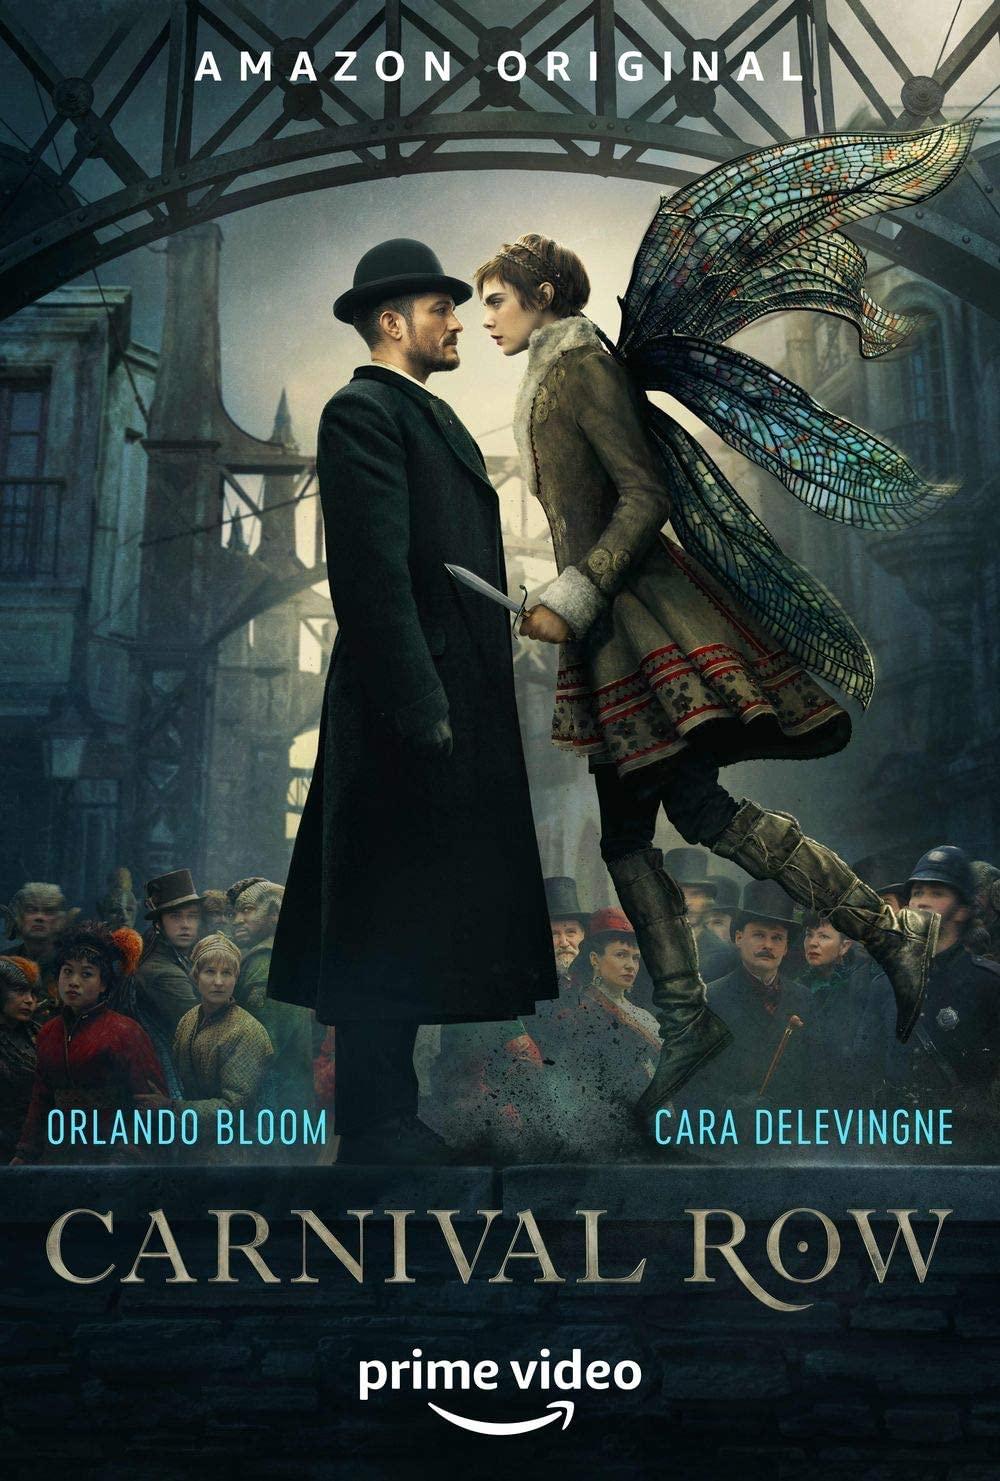 Lionbeen Carnival Row Movie Poster Cartel De La Pelicula 70 X 45 Cm Not A Dvd Amazon Es Hogar Carteleras De Cine Fila Peliculas